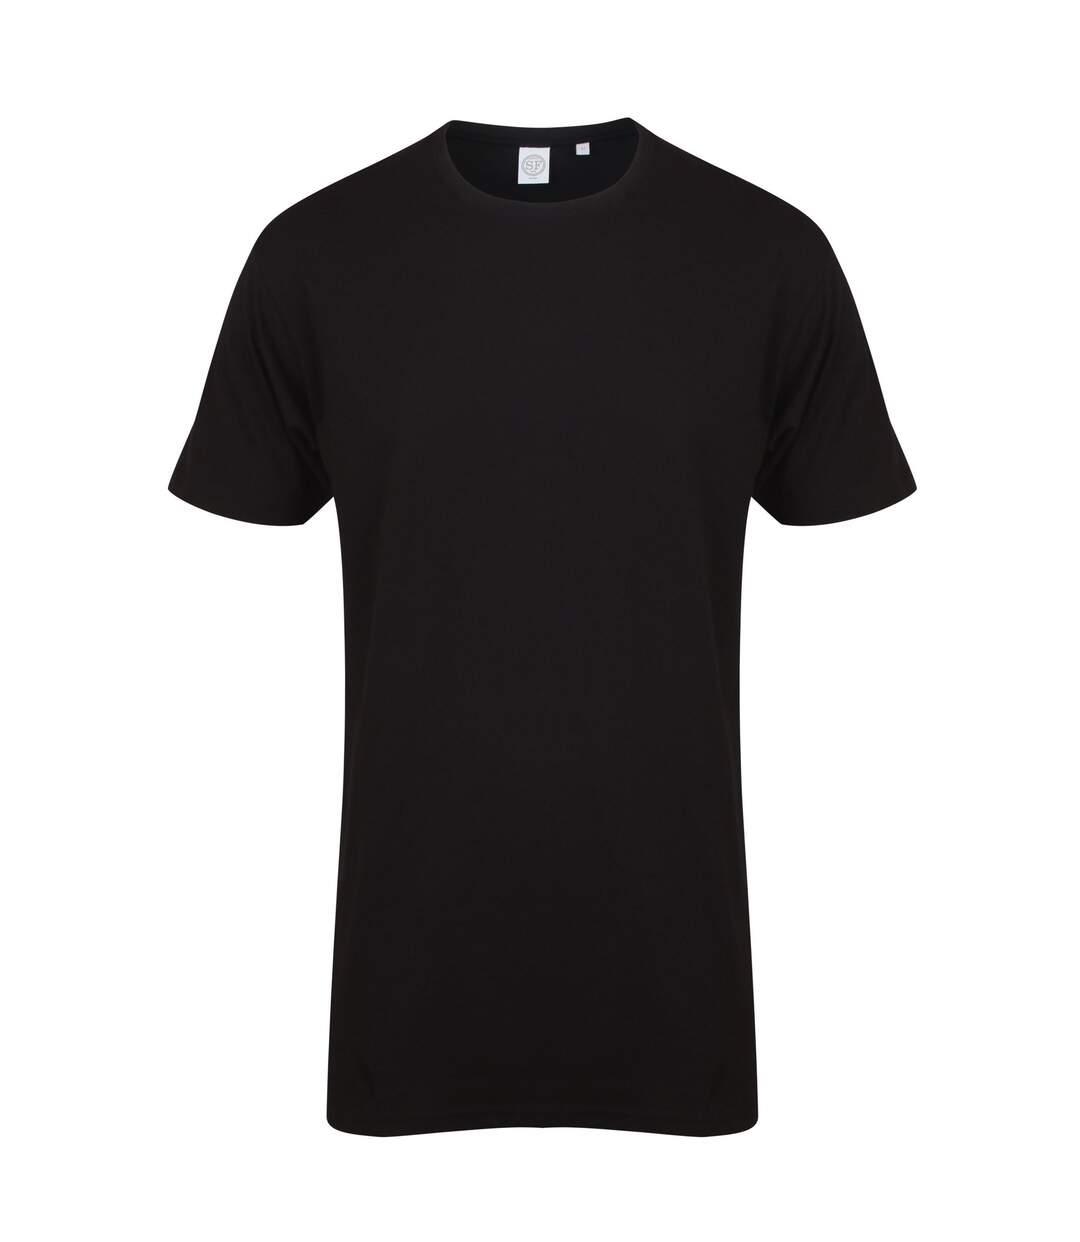 Skinnifit Mens Longline Dipped Hem T-Shirt (Black) - UTRW5293